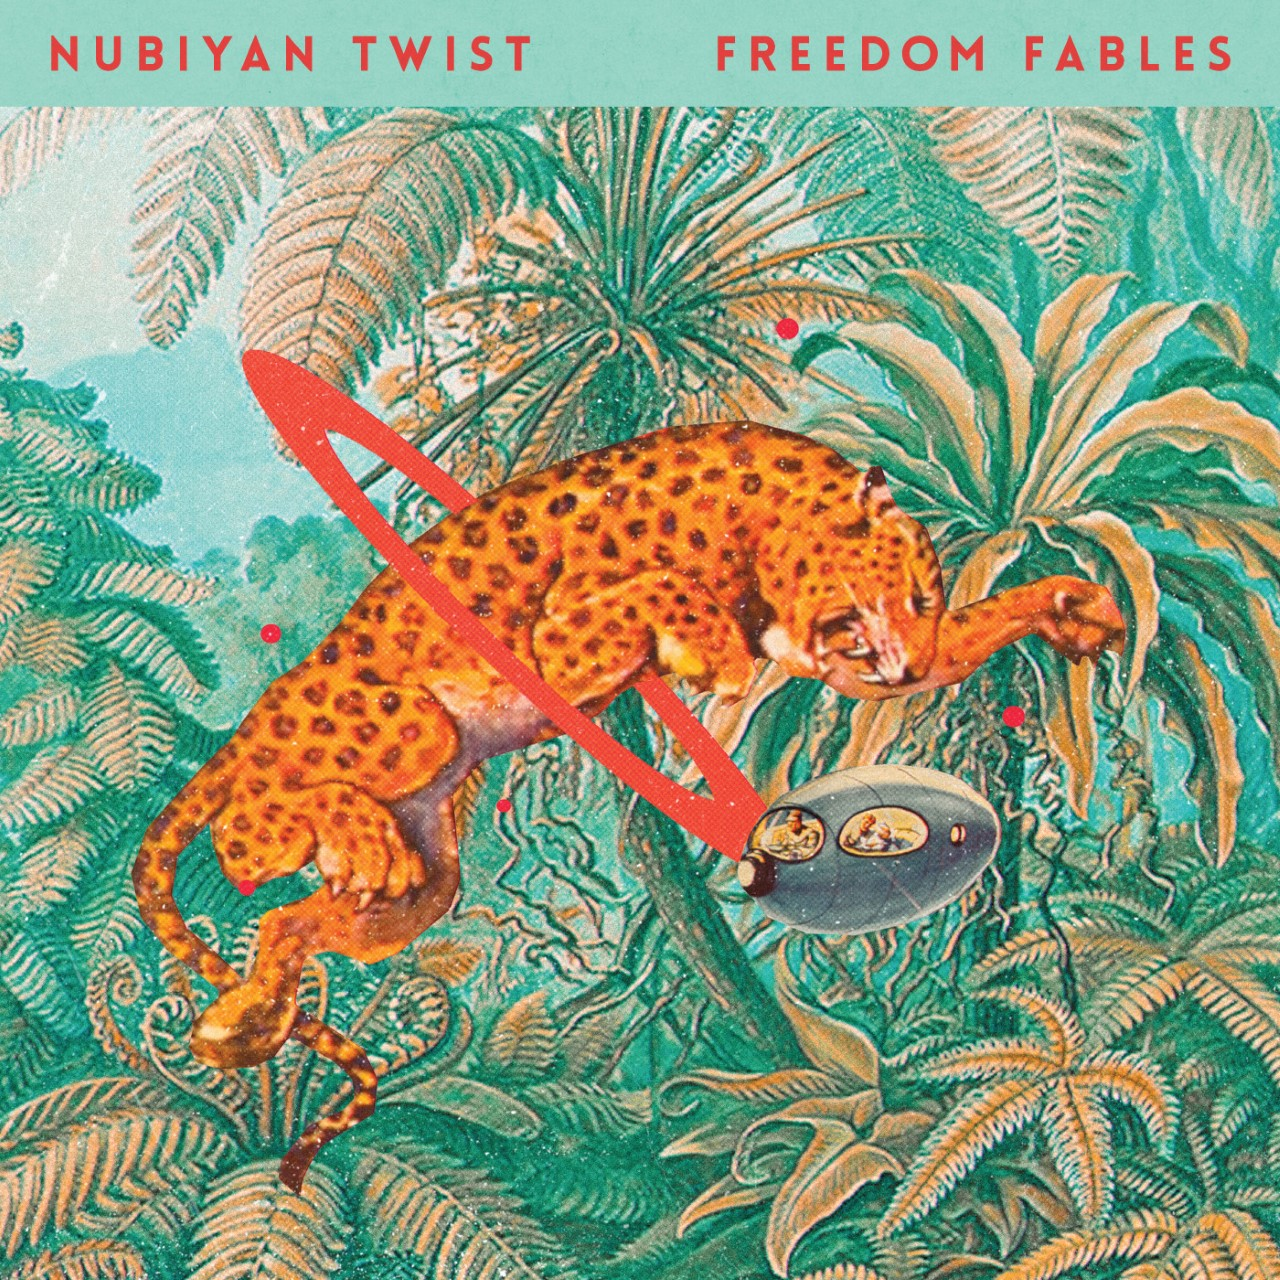 Nubiyan Twist